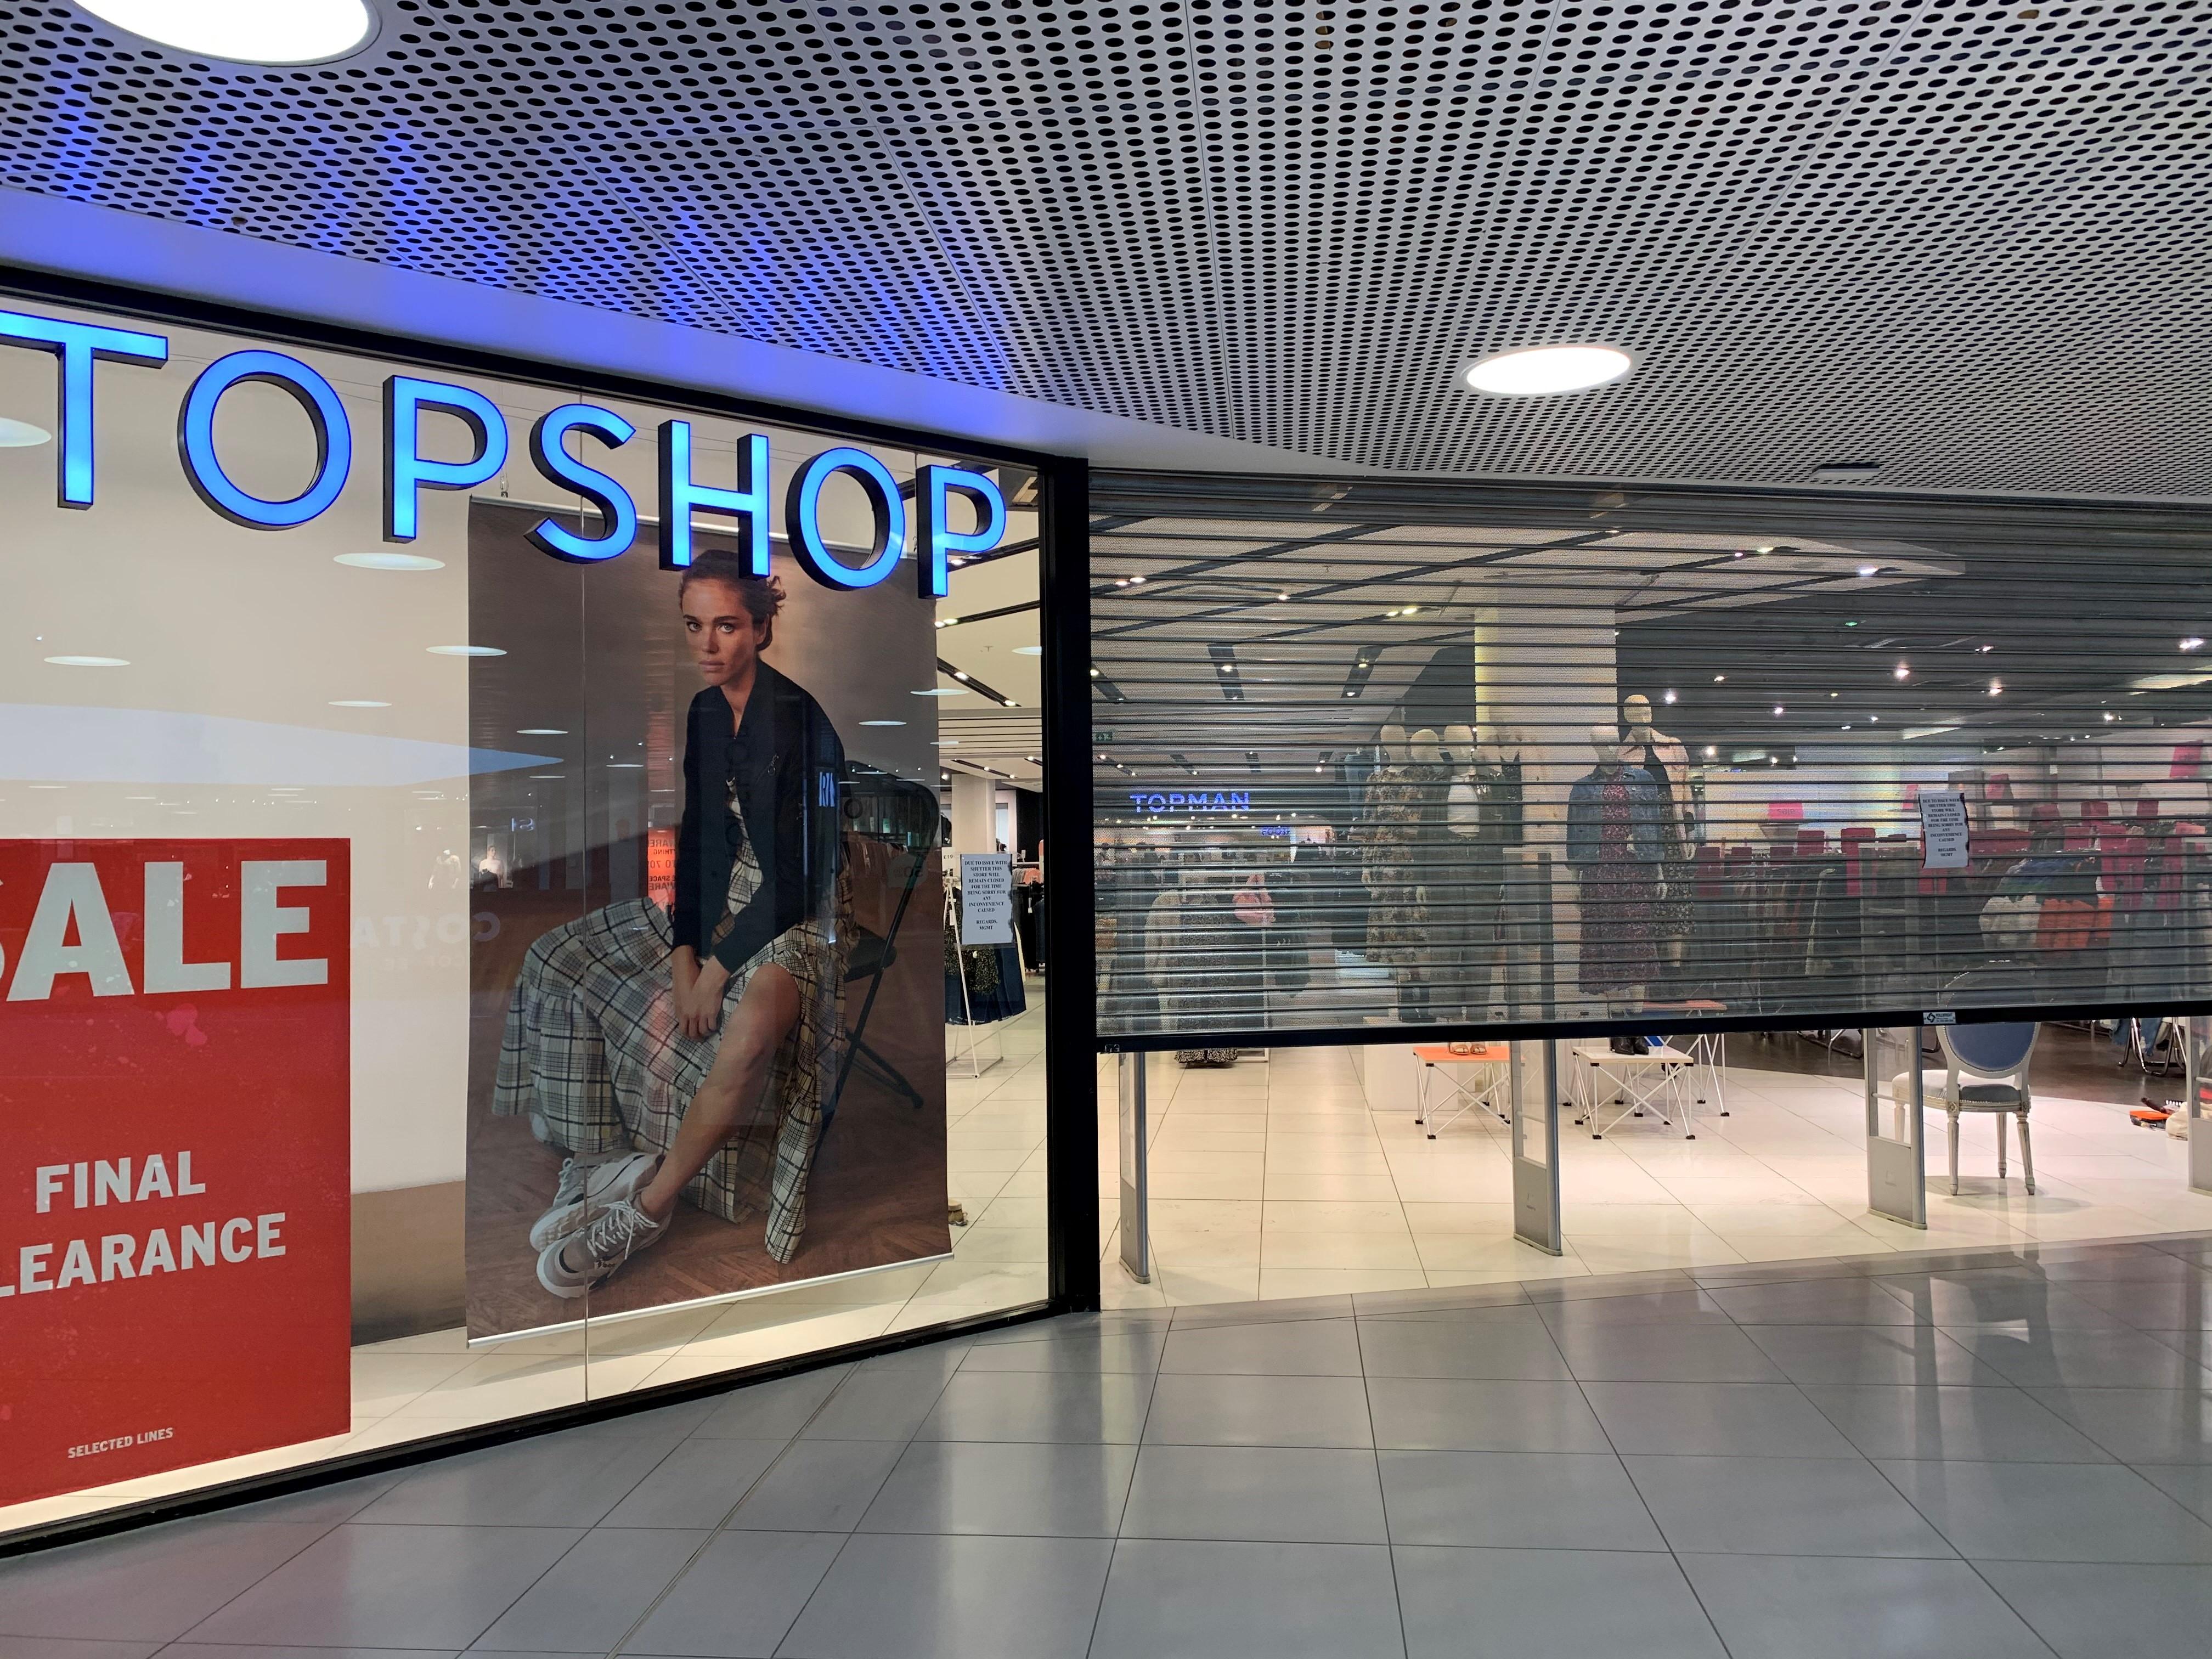 Topshop in the Bon Accord Centre